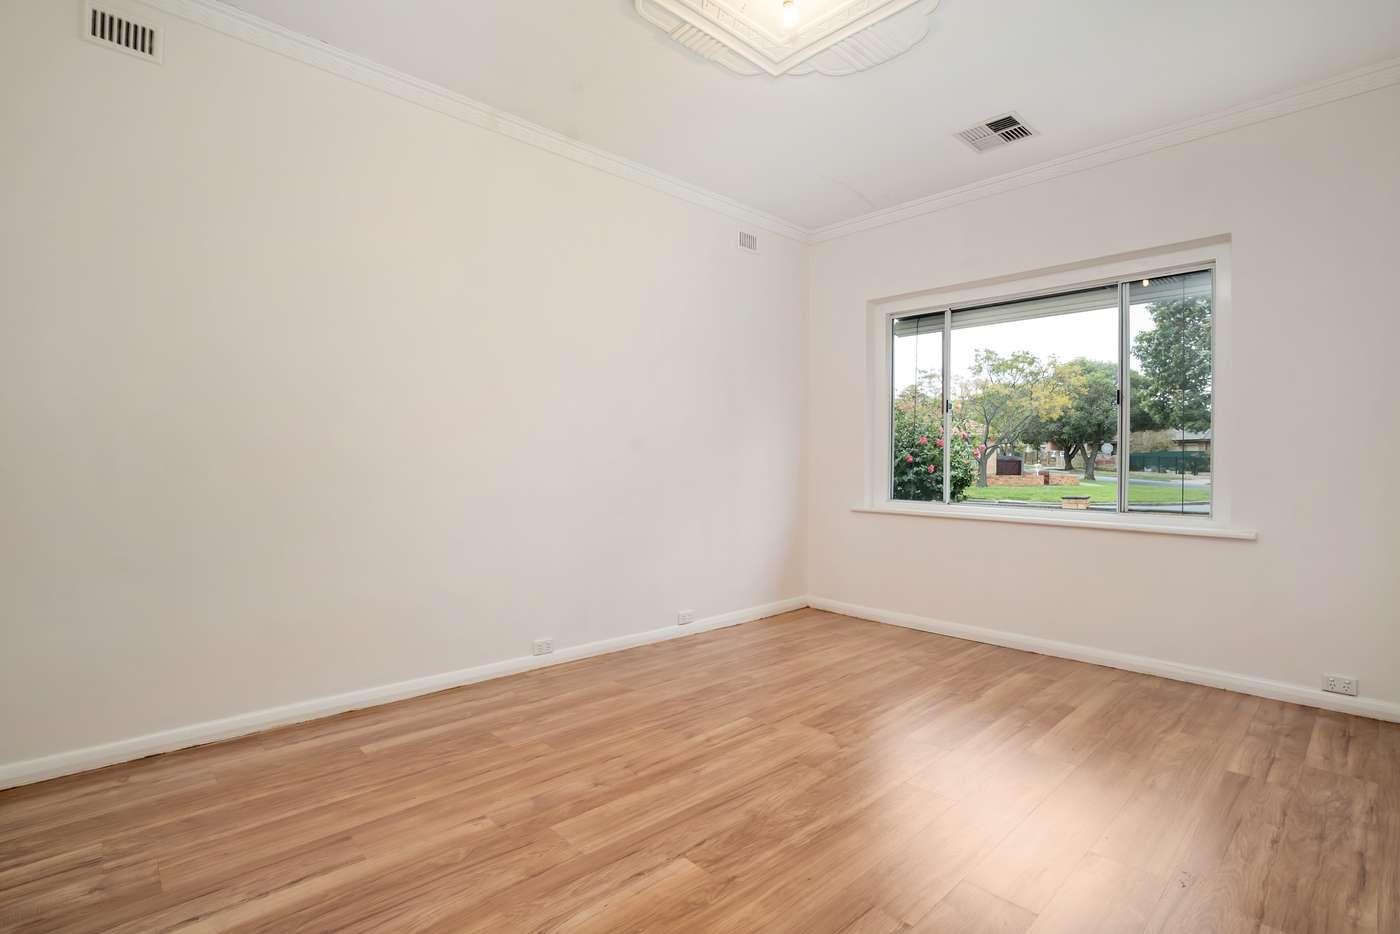 Sixth view of Homely house listing, 19 Minerva Crescent, Croydon Park SA 5008